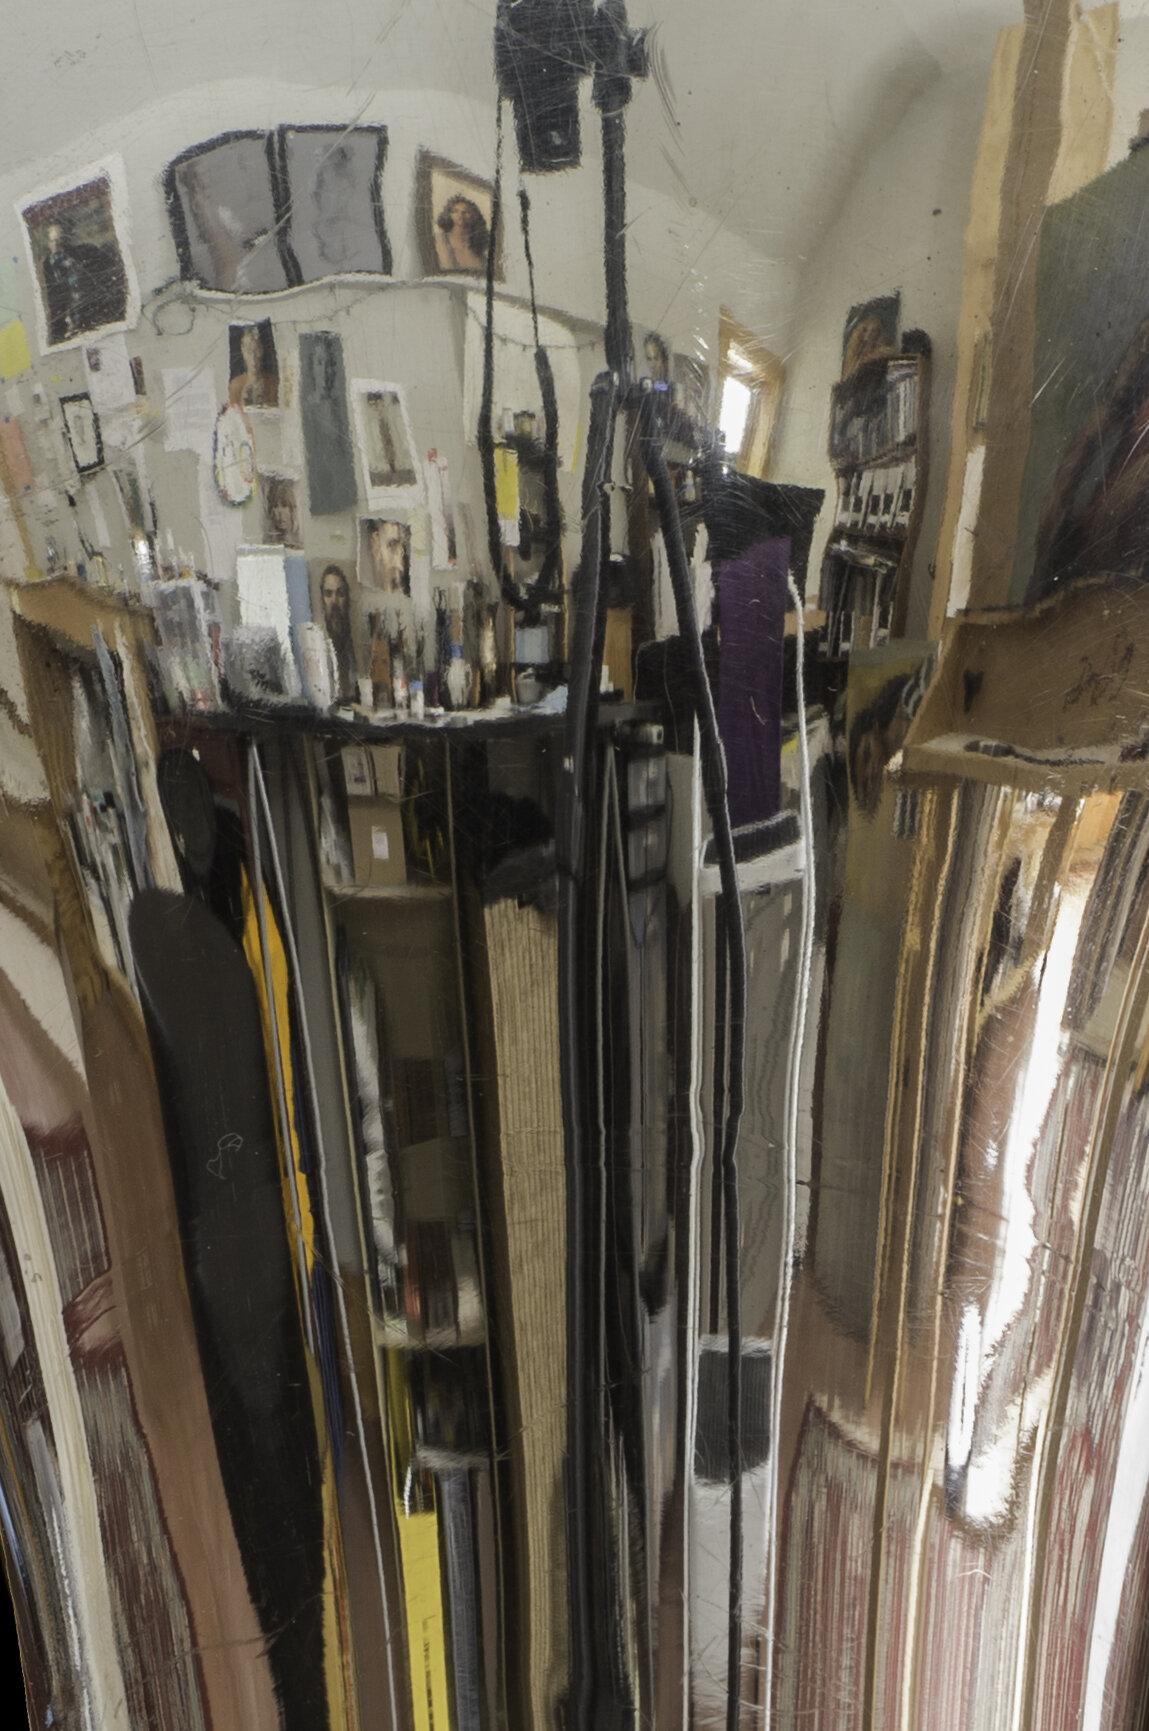 _8 Art and music--August's studio reflected in my flugelhorn.jpg